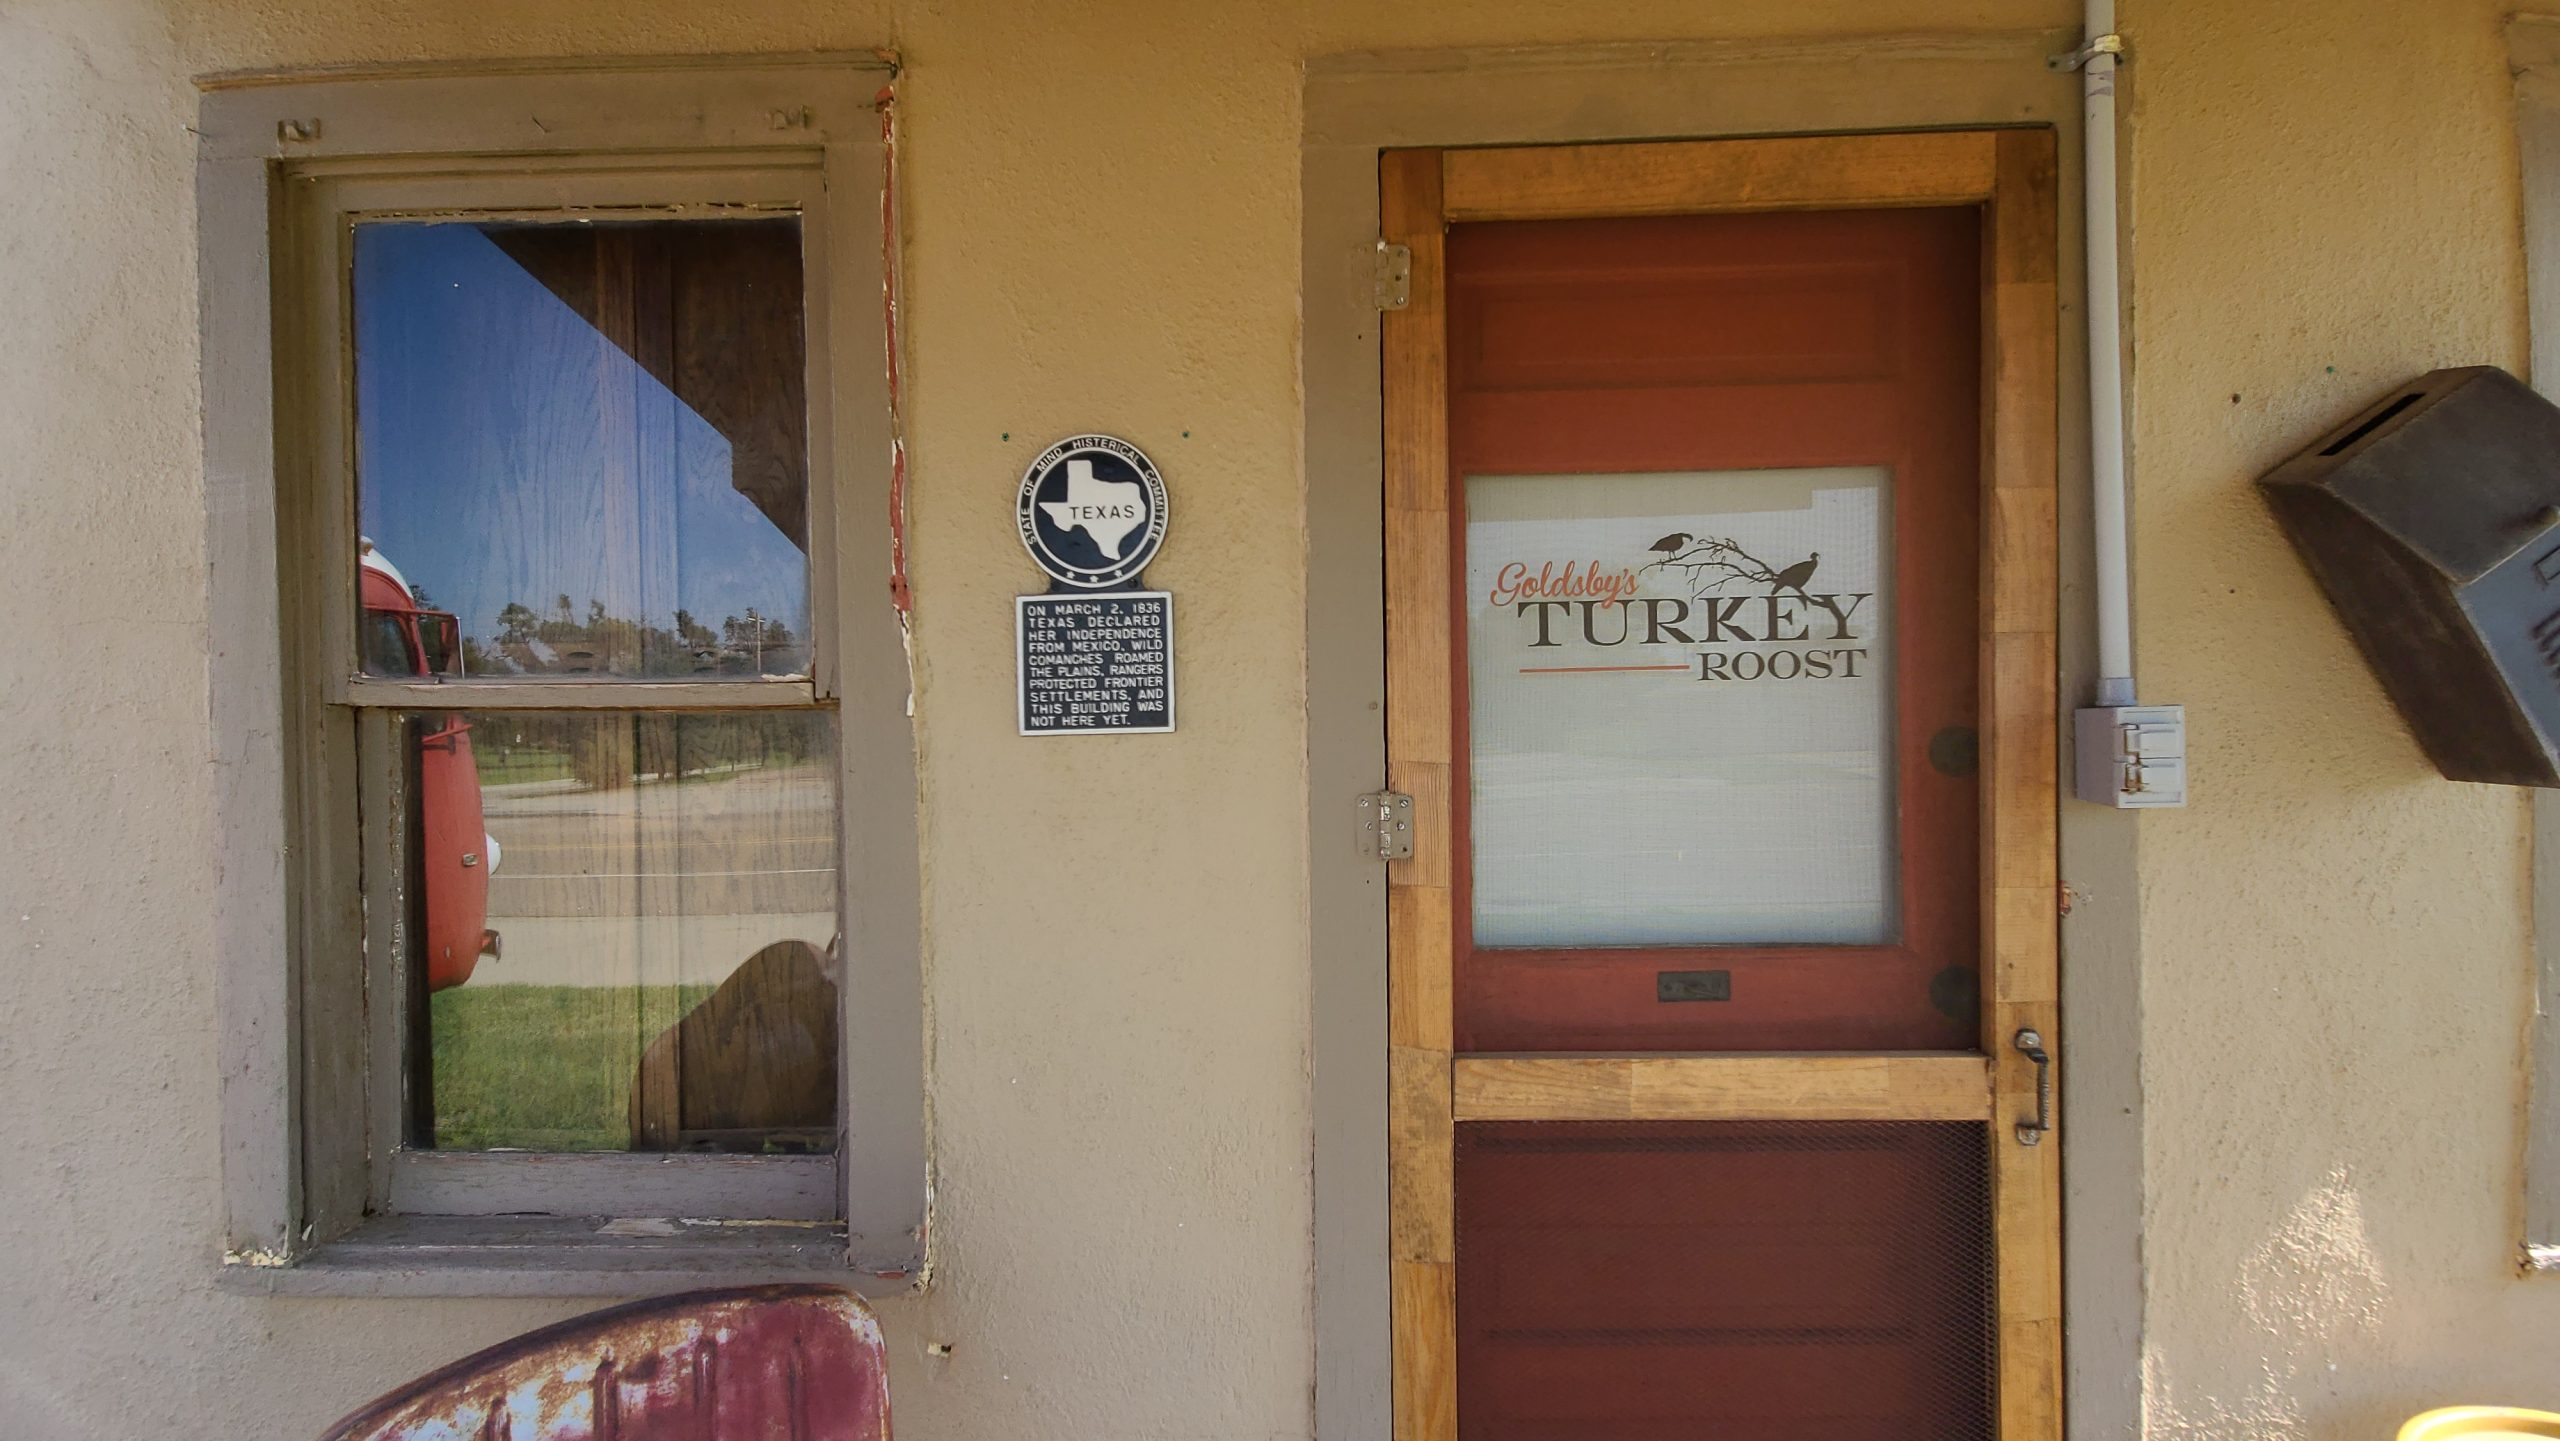 The Turkey Roost in Turkey, Texas